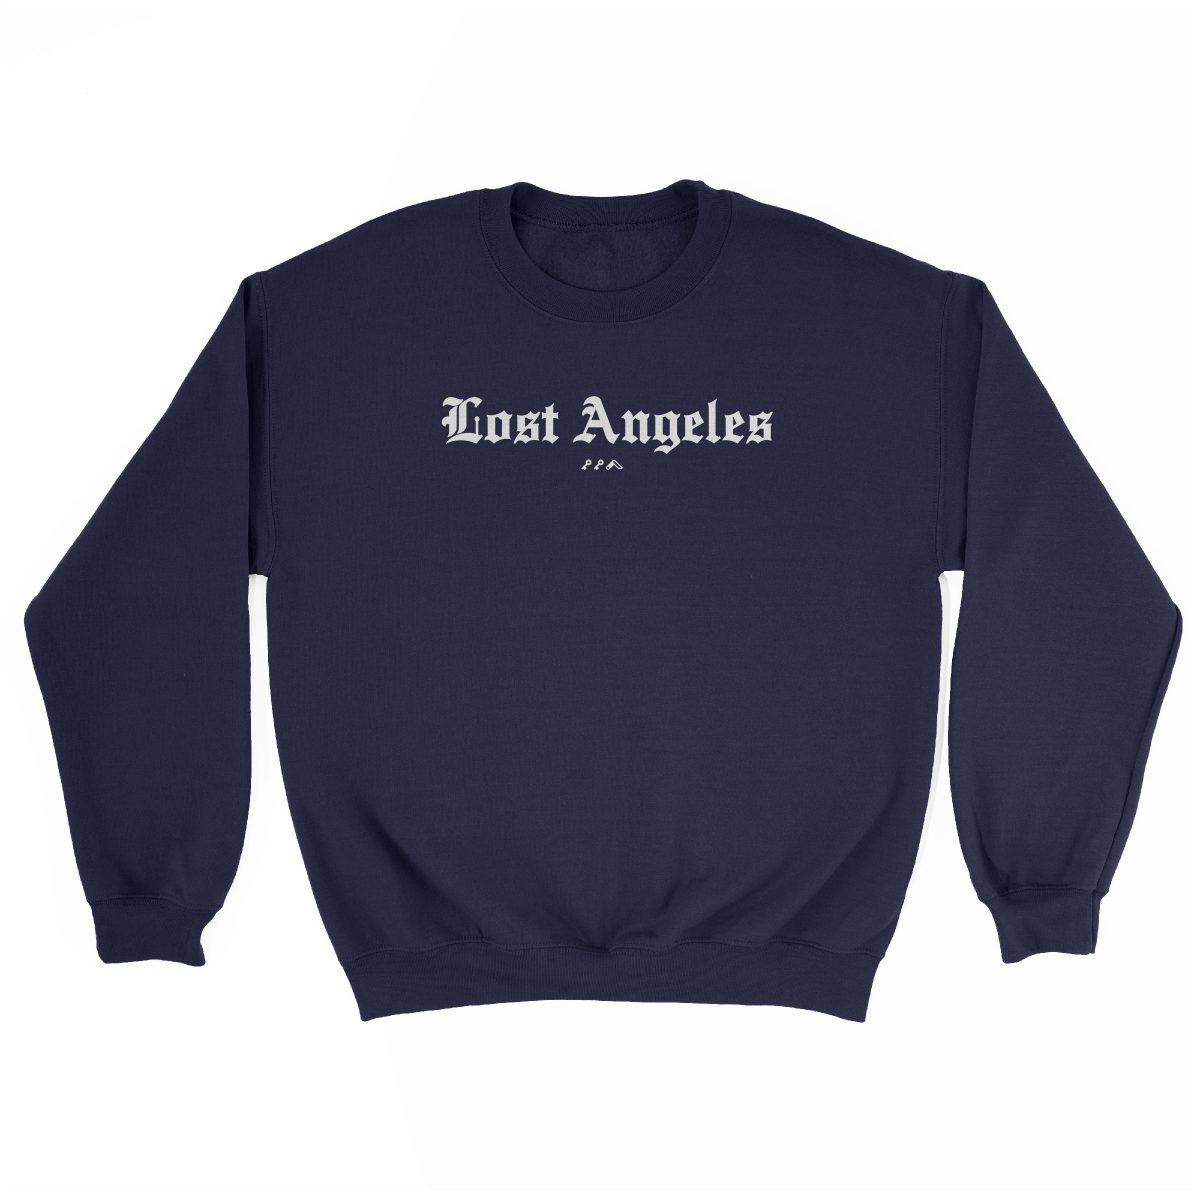 """Lost Angeles"" soft sweatshirt in navy by KIKICUTT"